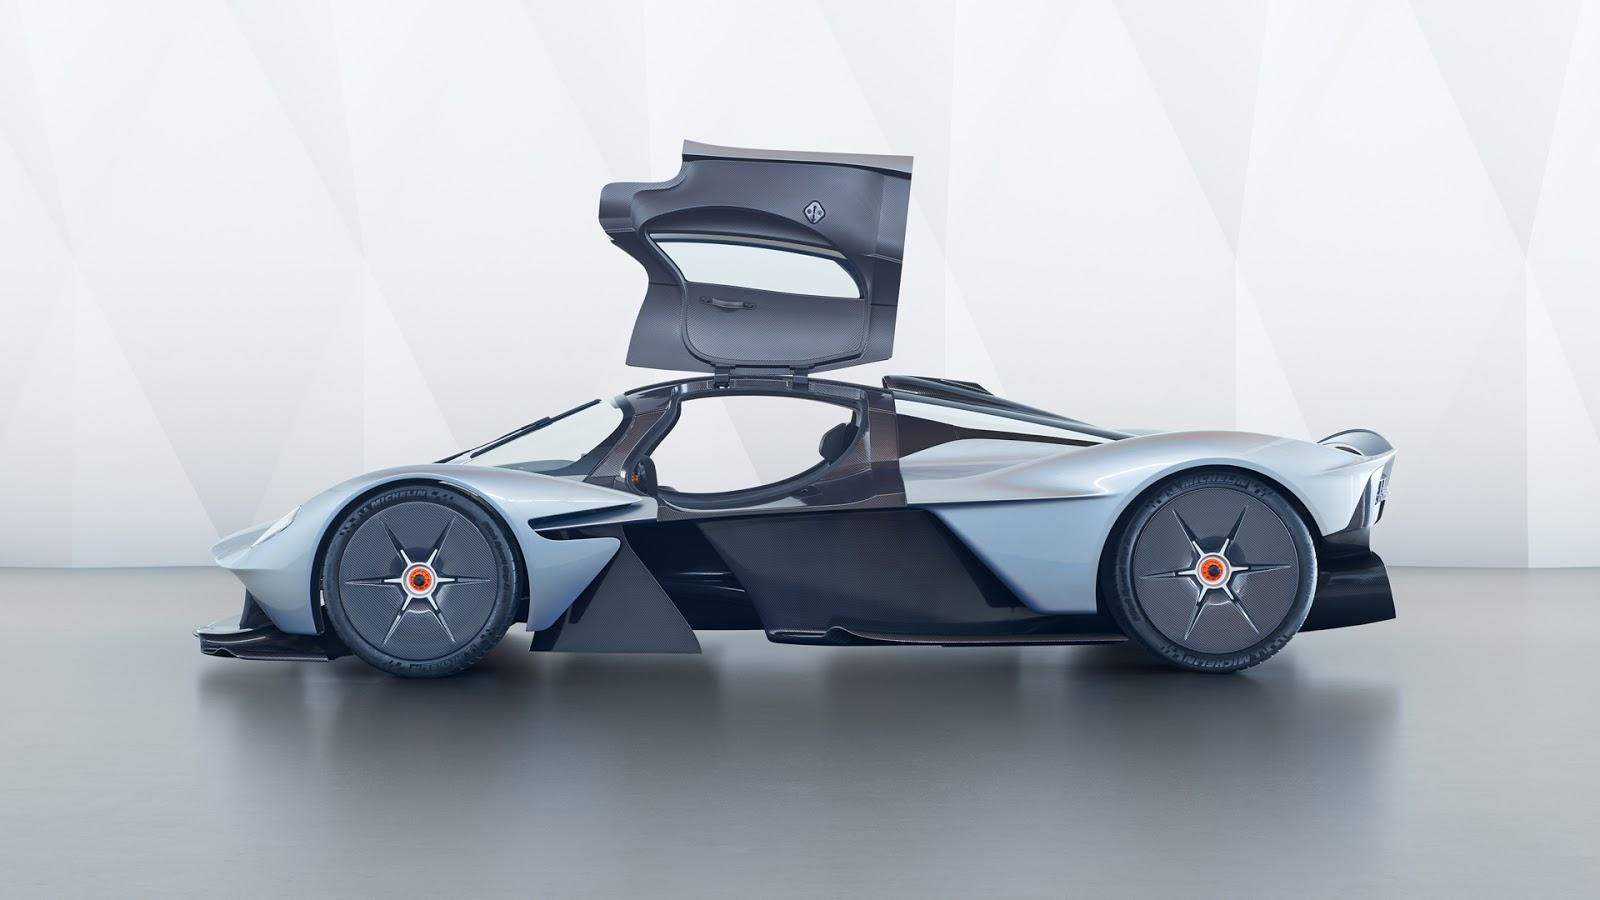 aston martin gets cosworth on board its f1 engine program - car news